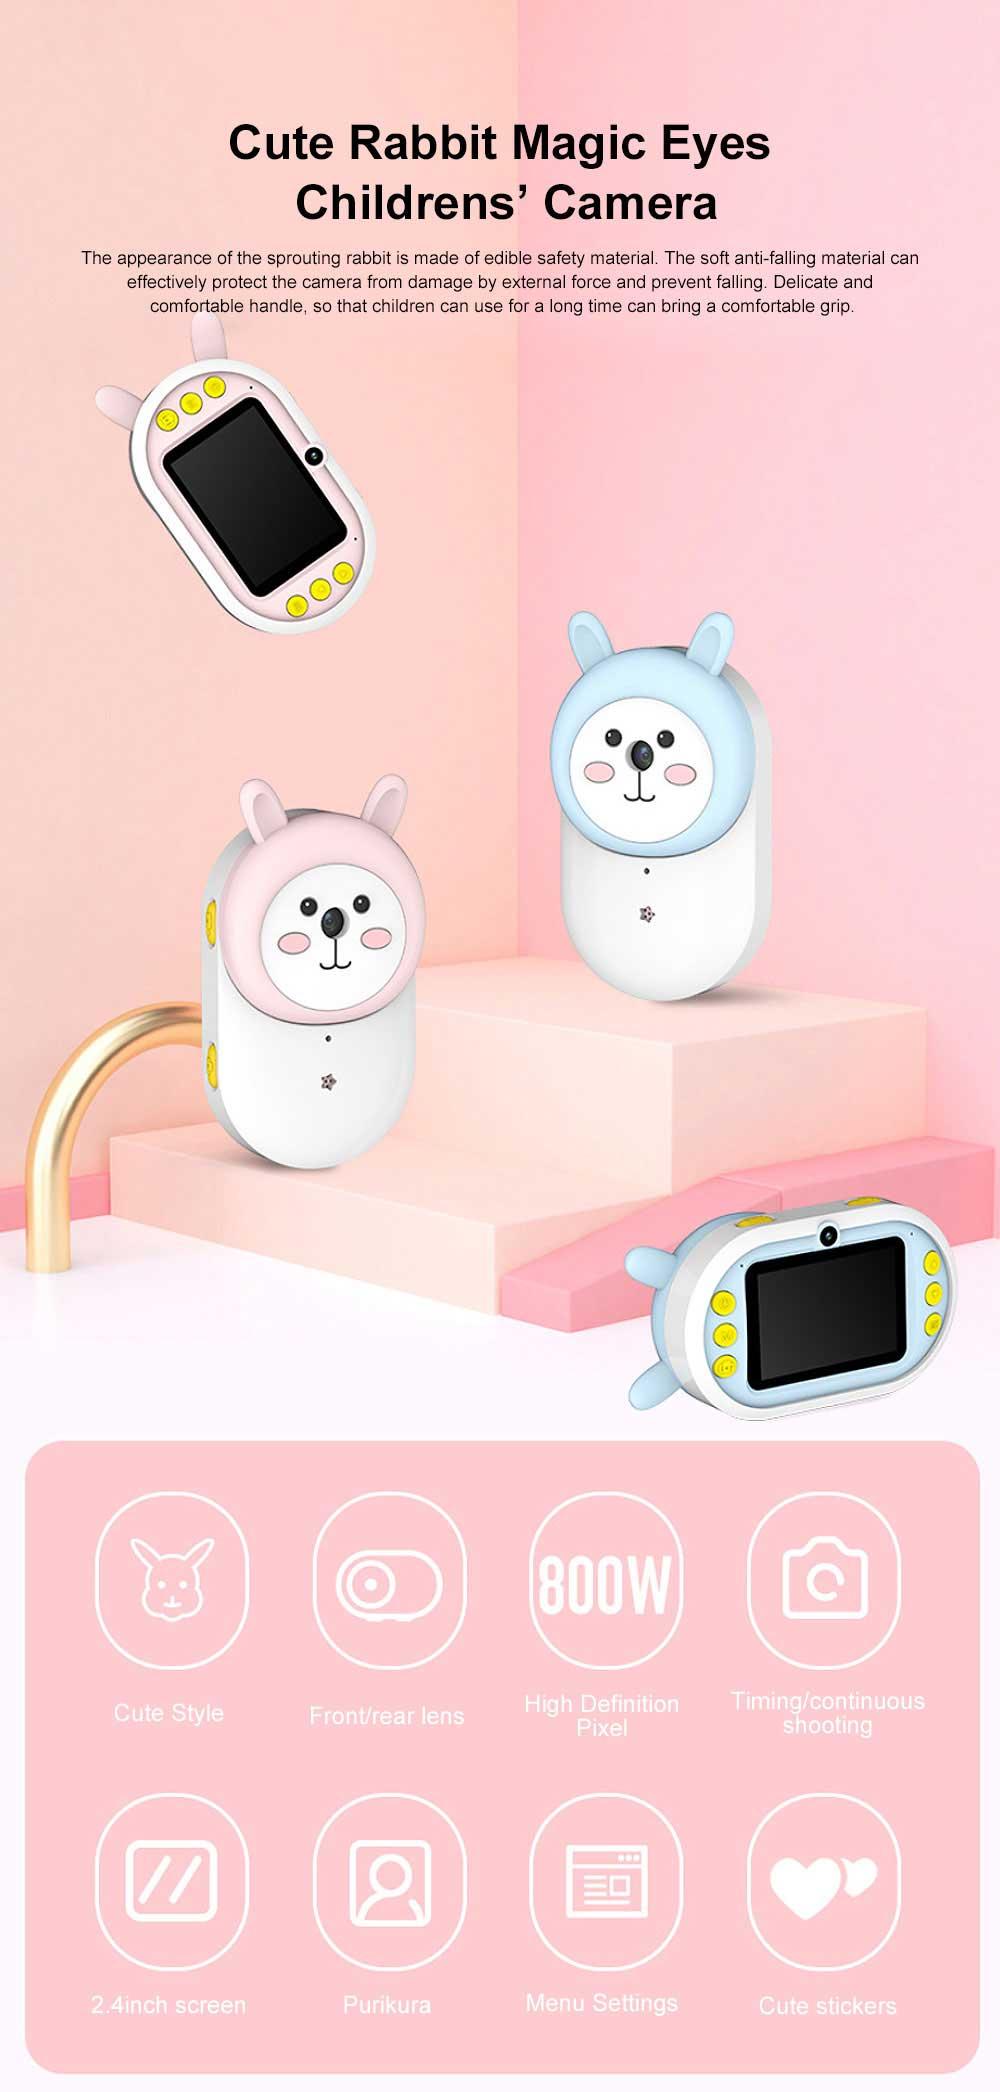 Cute Rabbit Magic Eyes Childrens' Wifi HD Camera 2.4 Inch Wifi-Connected New 2 Lens 800W HD Kids Camera 0